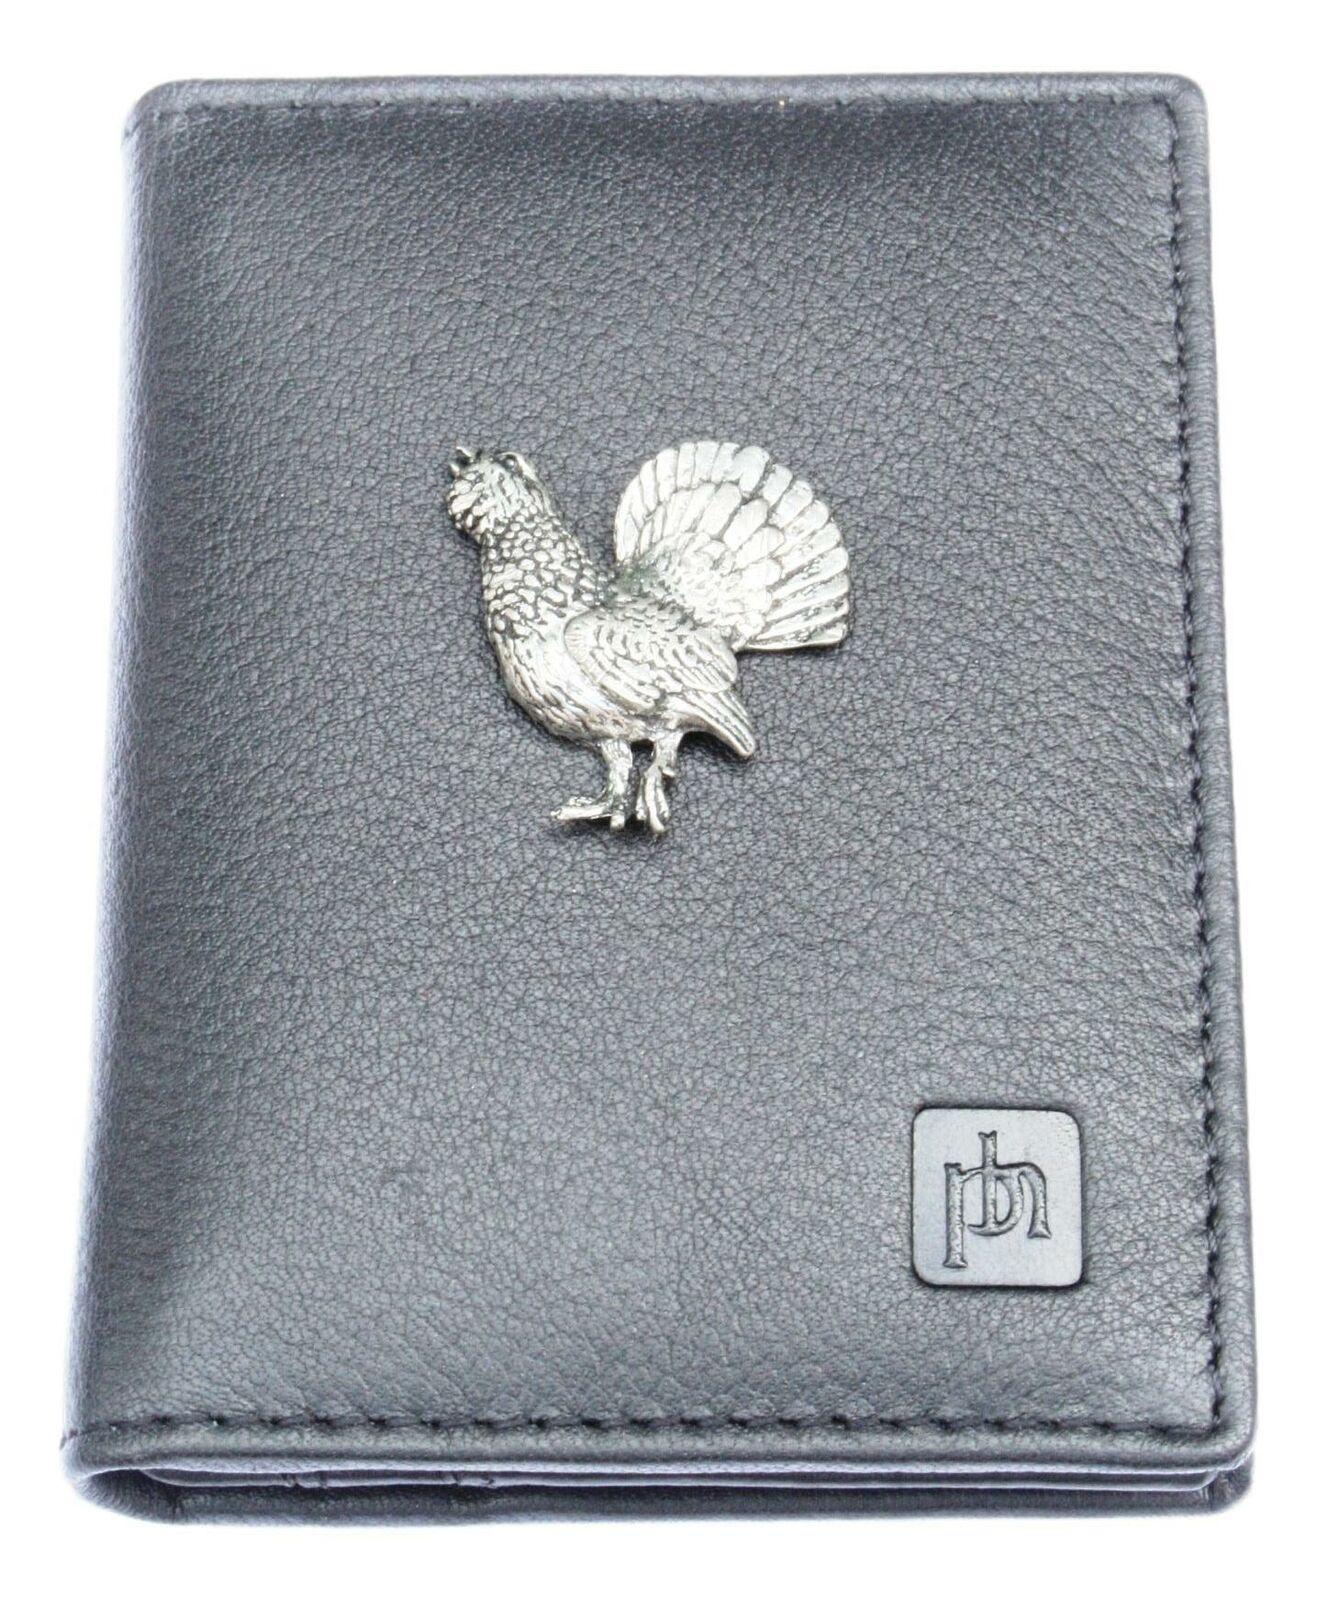 Capercaillie Bifold Card Holder Leather Black Wallet RFID Safe 62